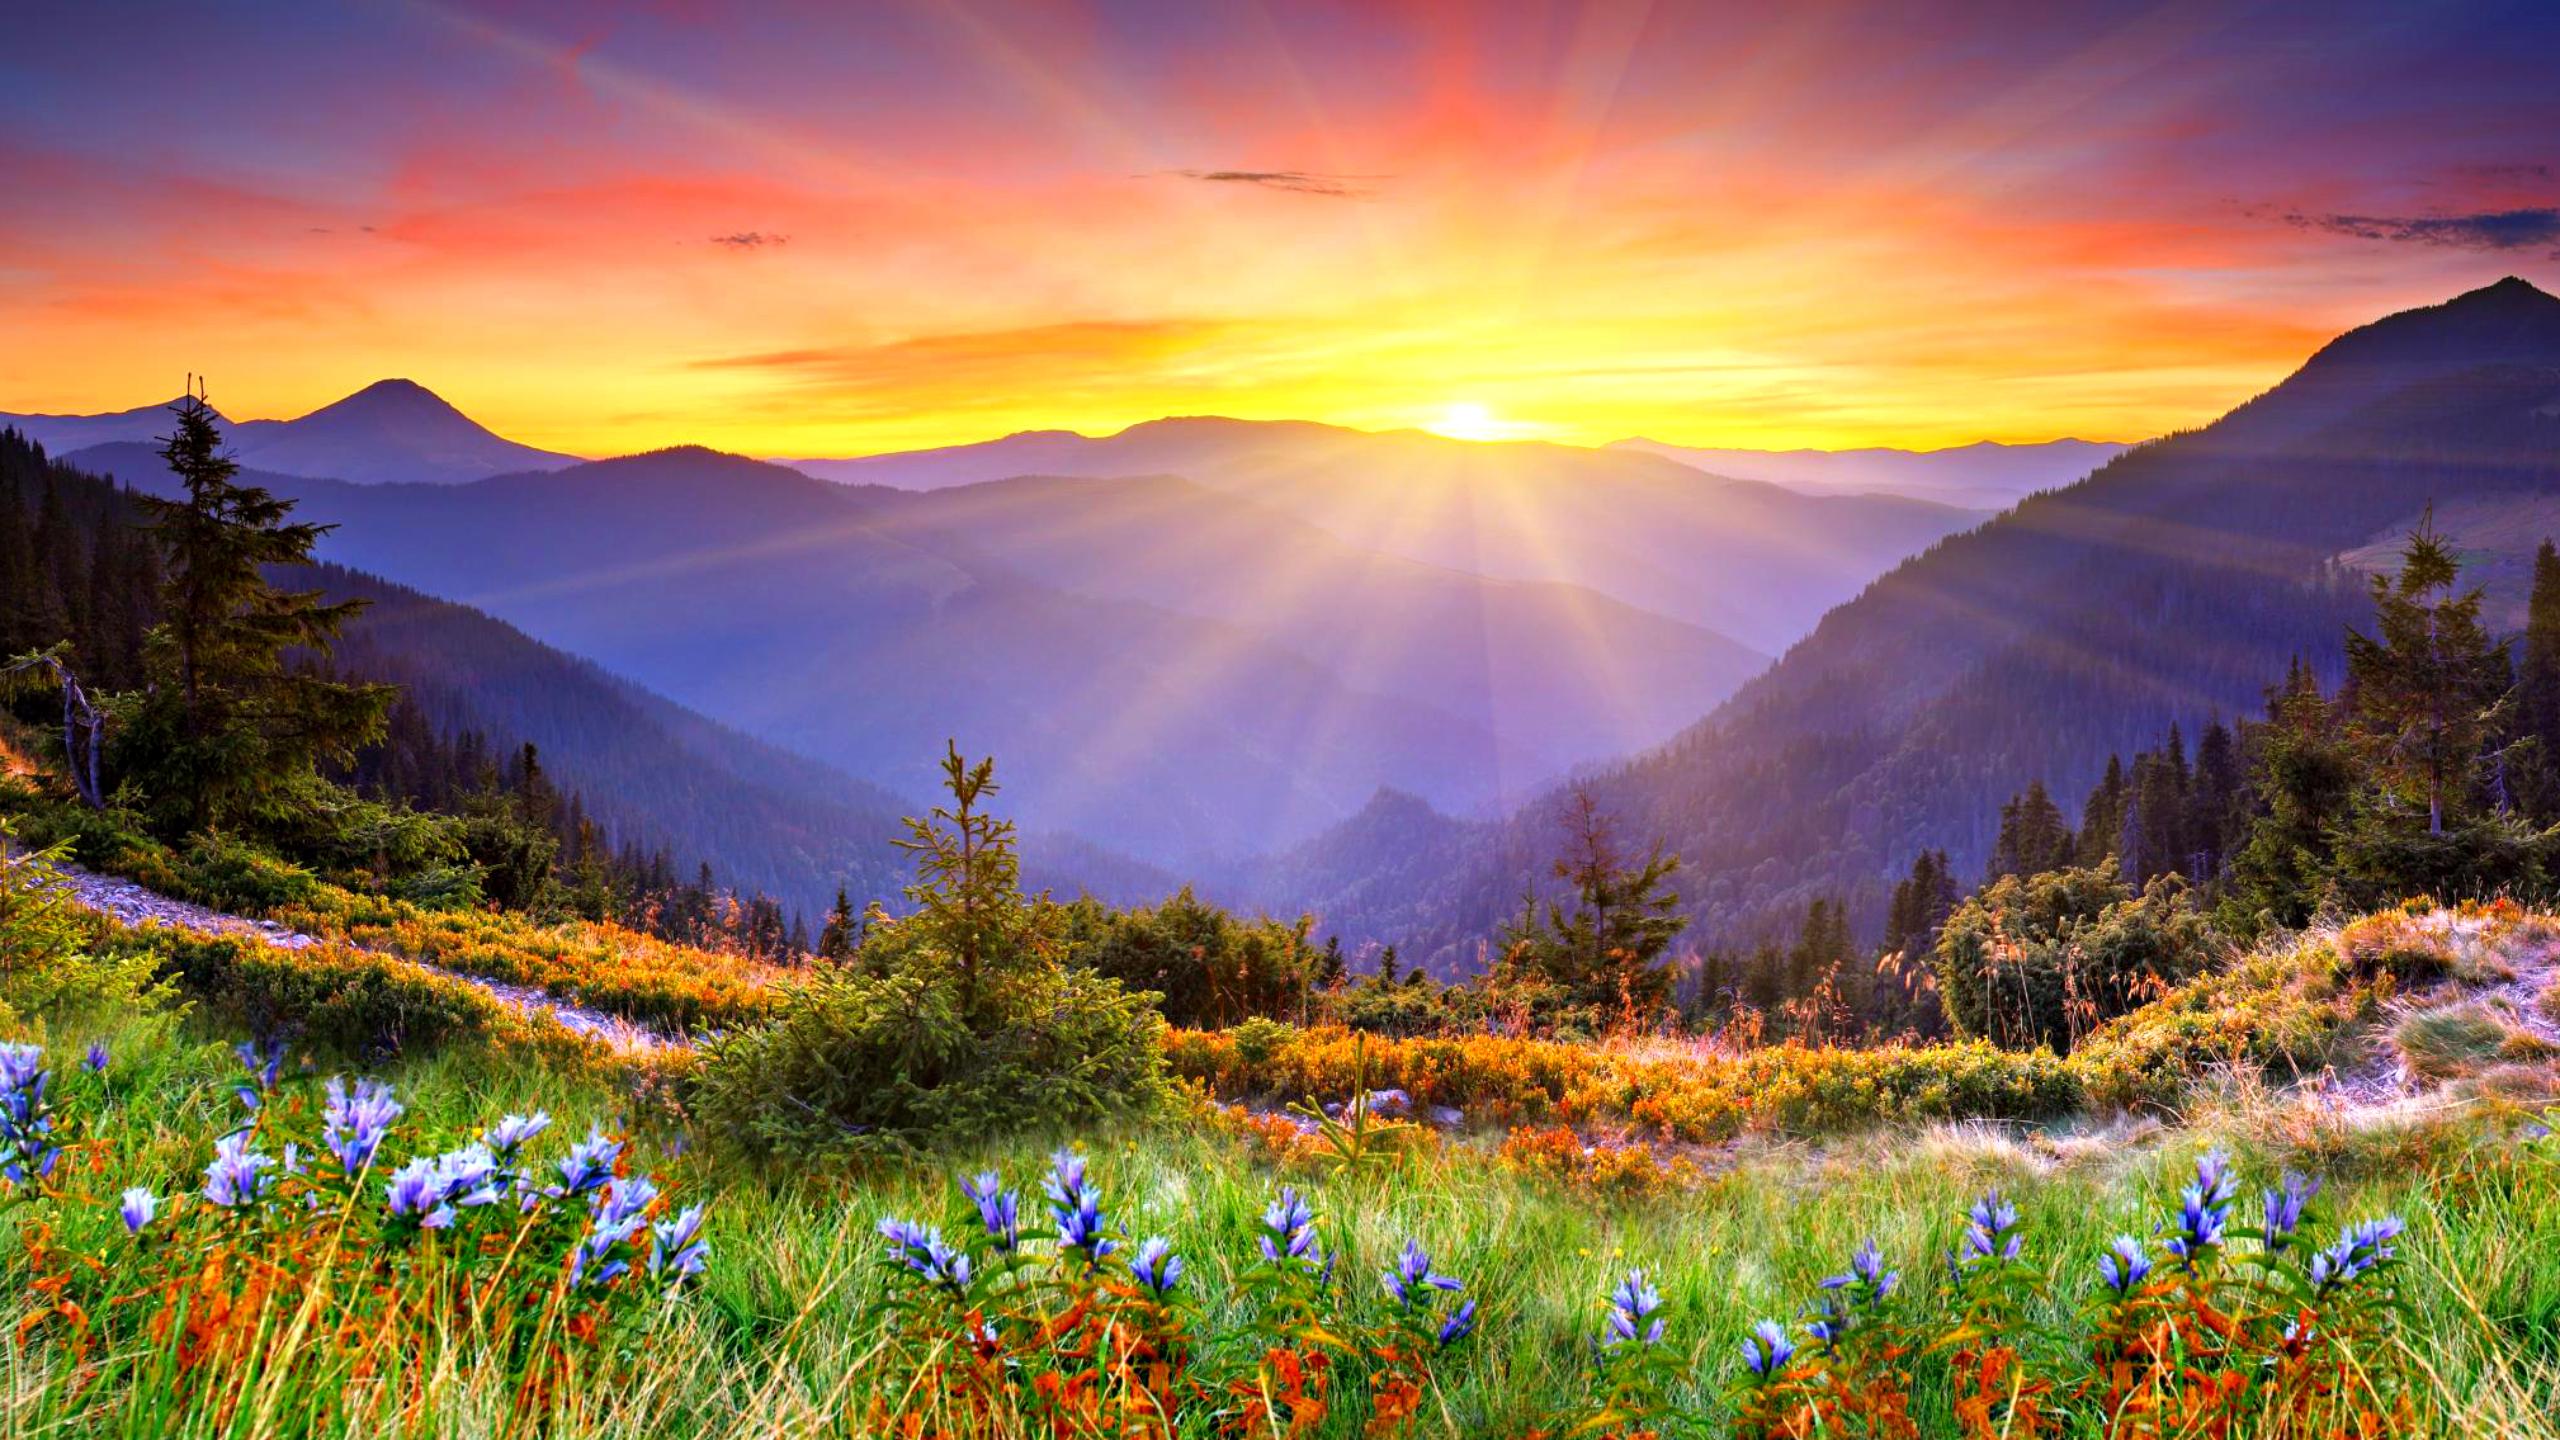 im36 Beautiful Sunny Day Wallpaper 2560x1440 px   Picseriocom 2560x1440